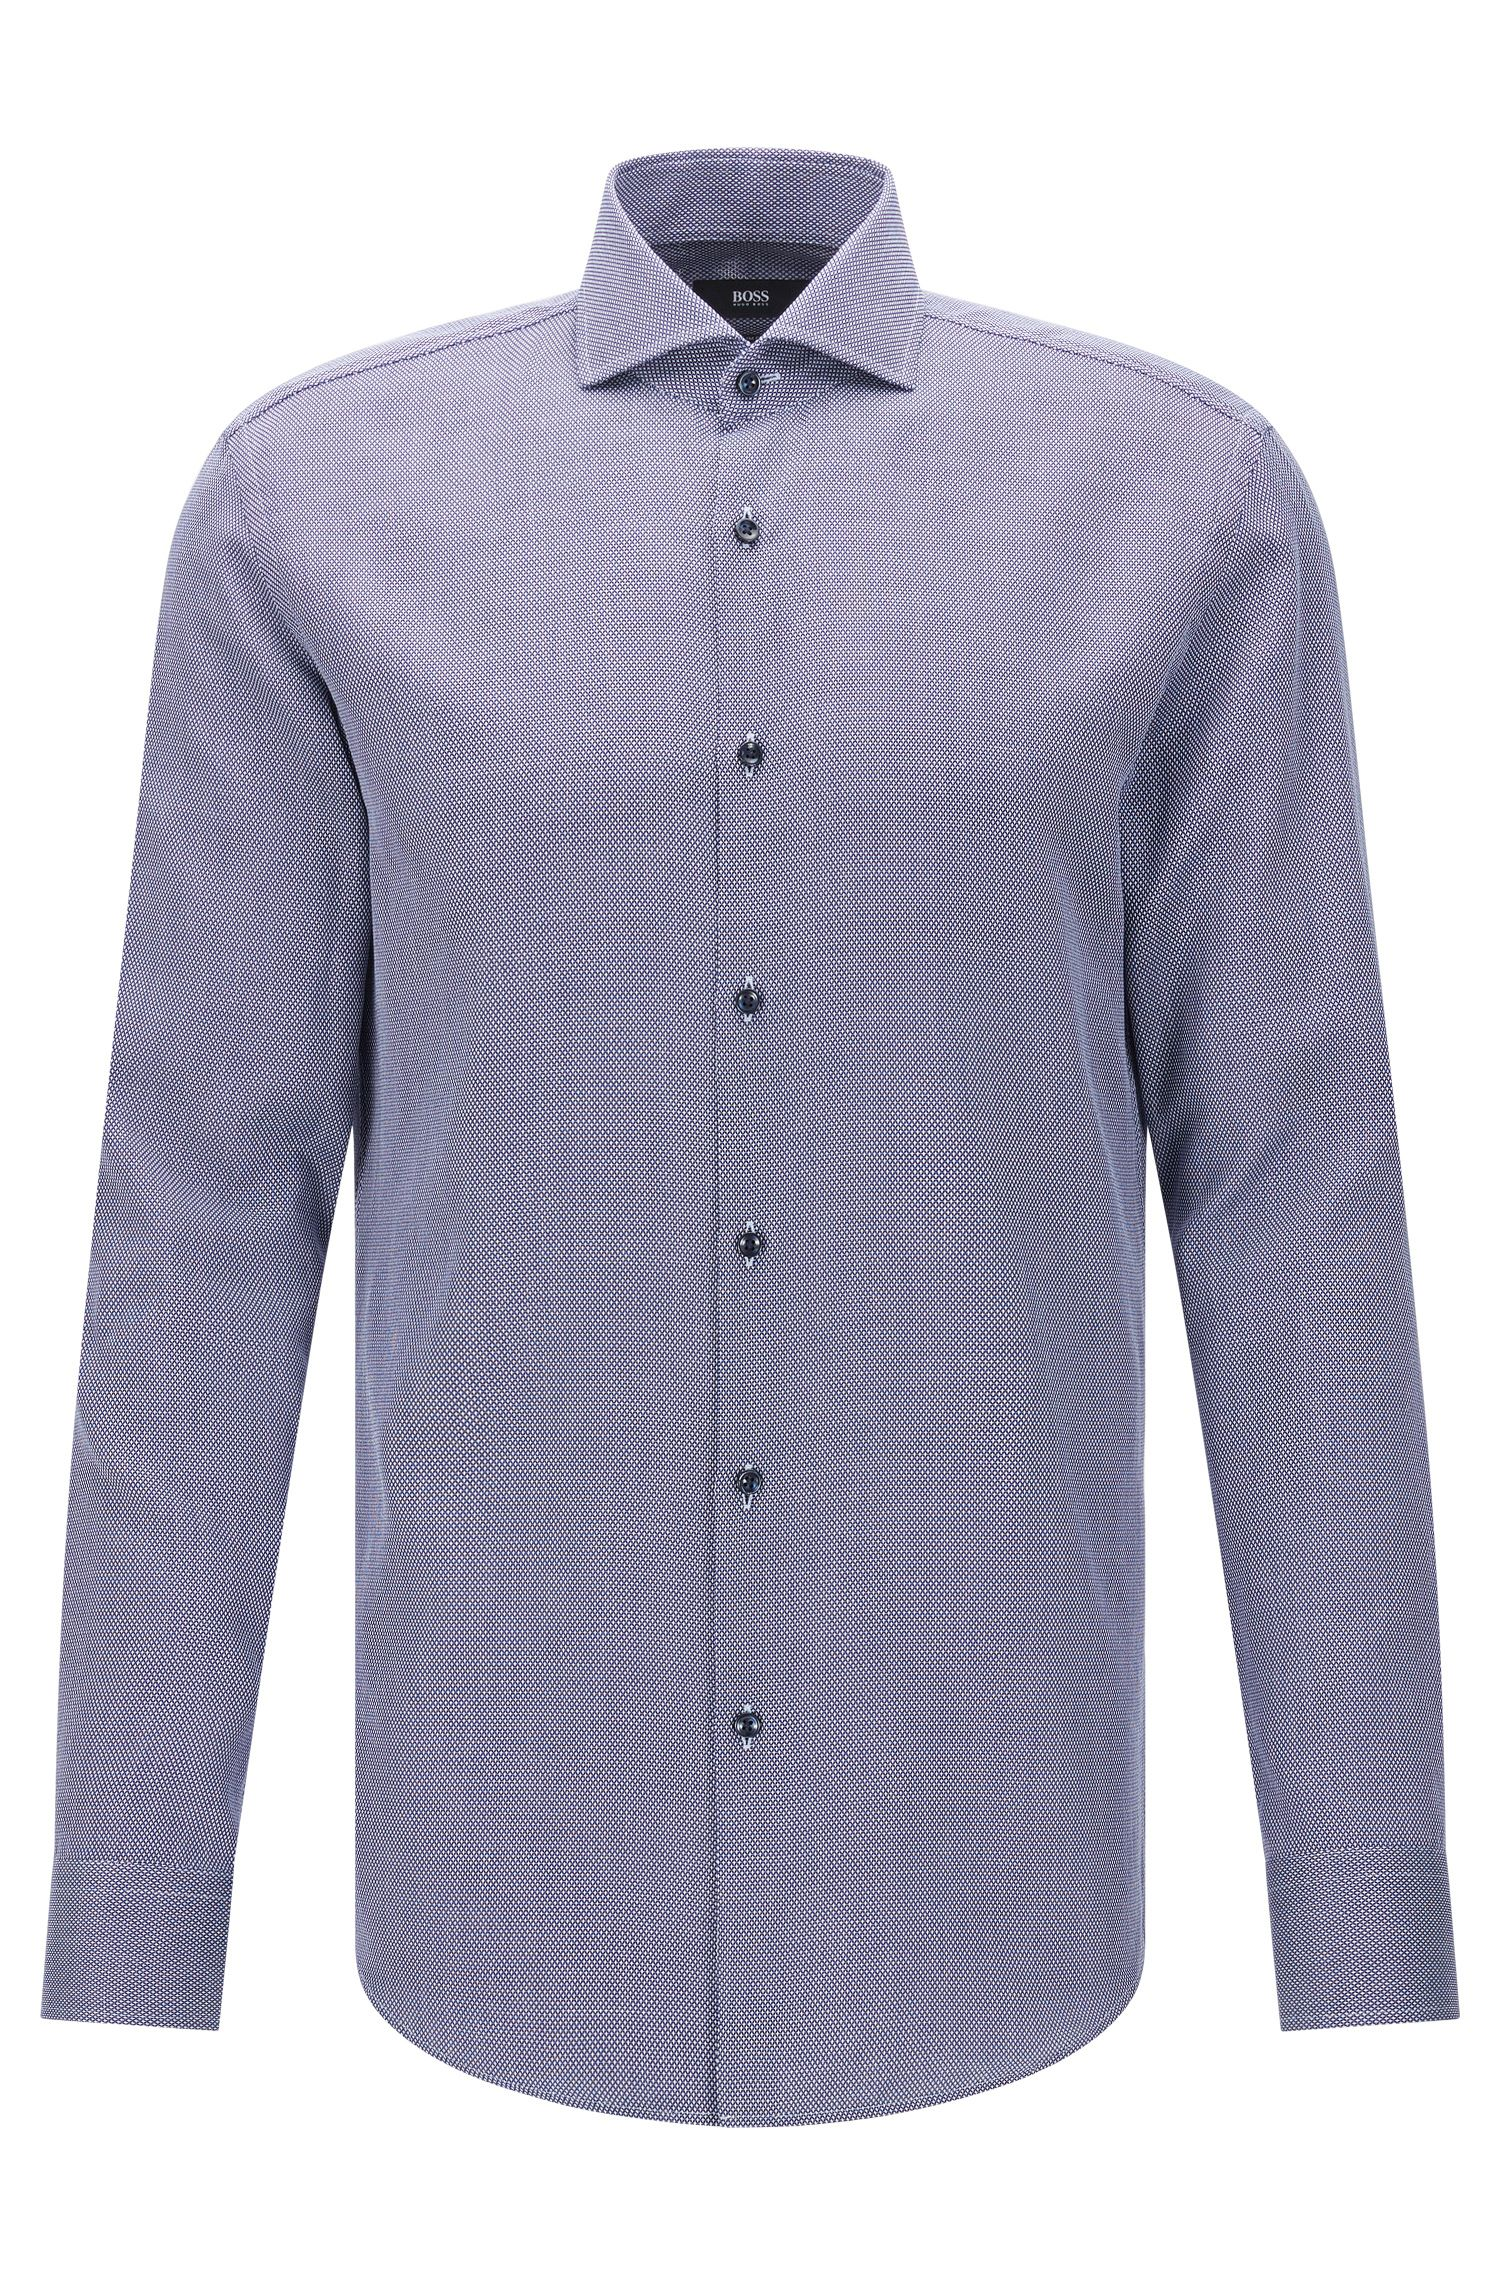 Dobby Cotton Patterned Dress Shirt, Slim Fit | Jason